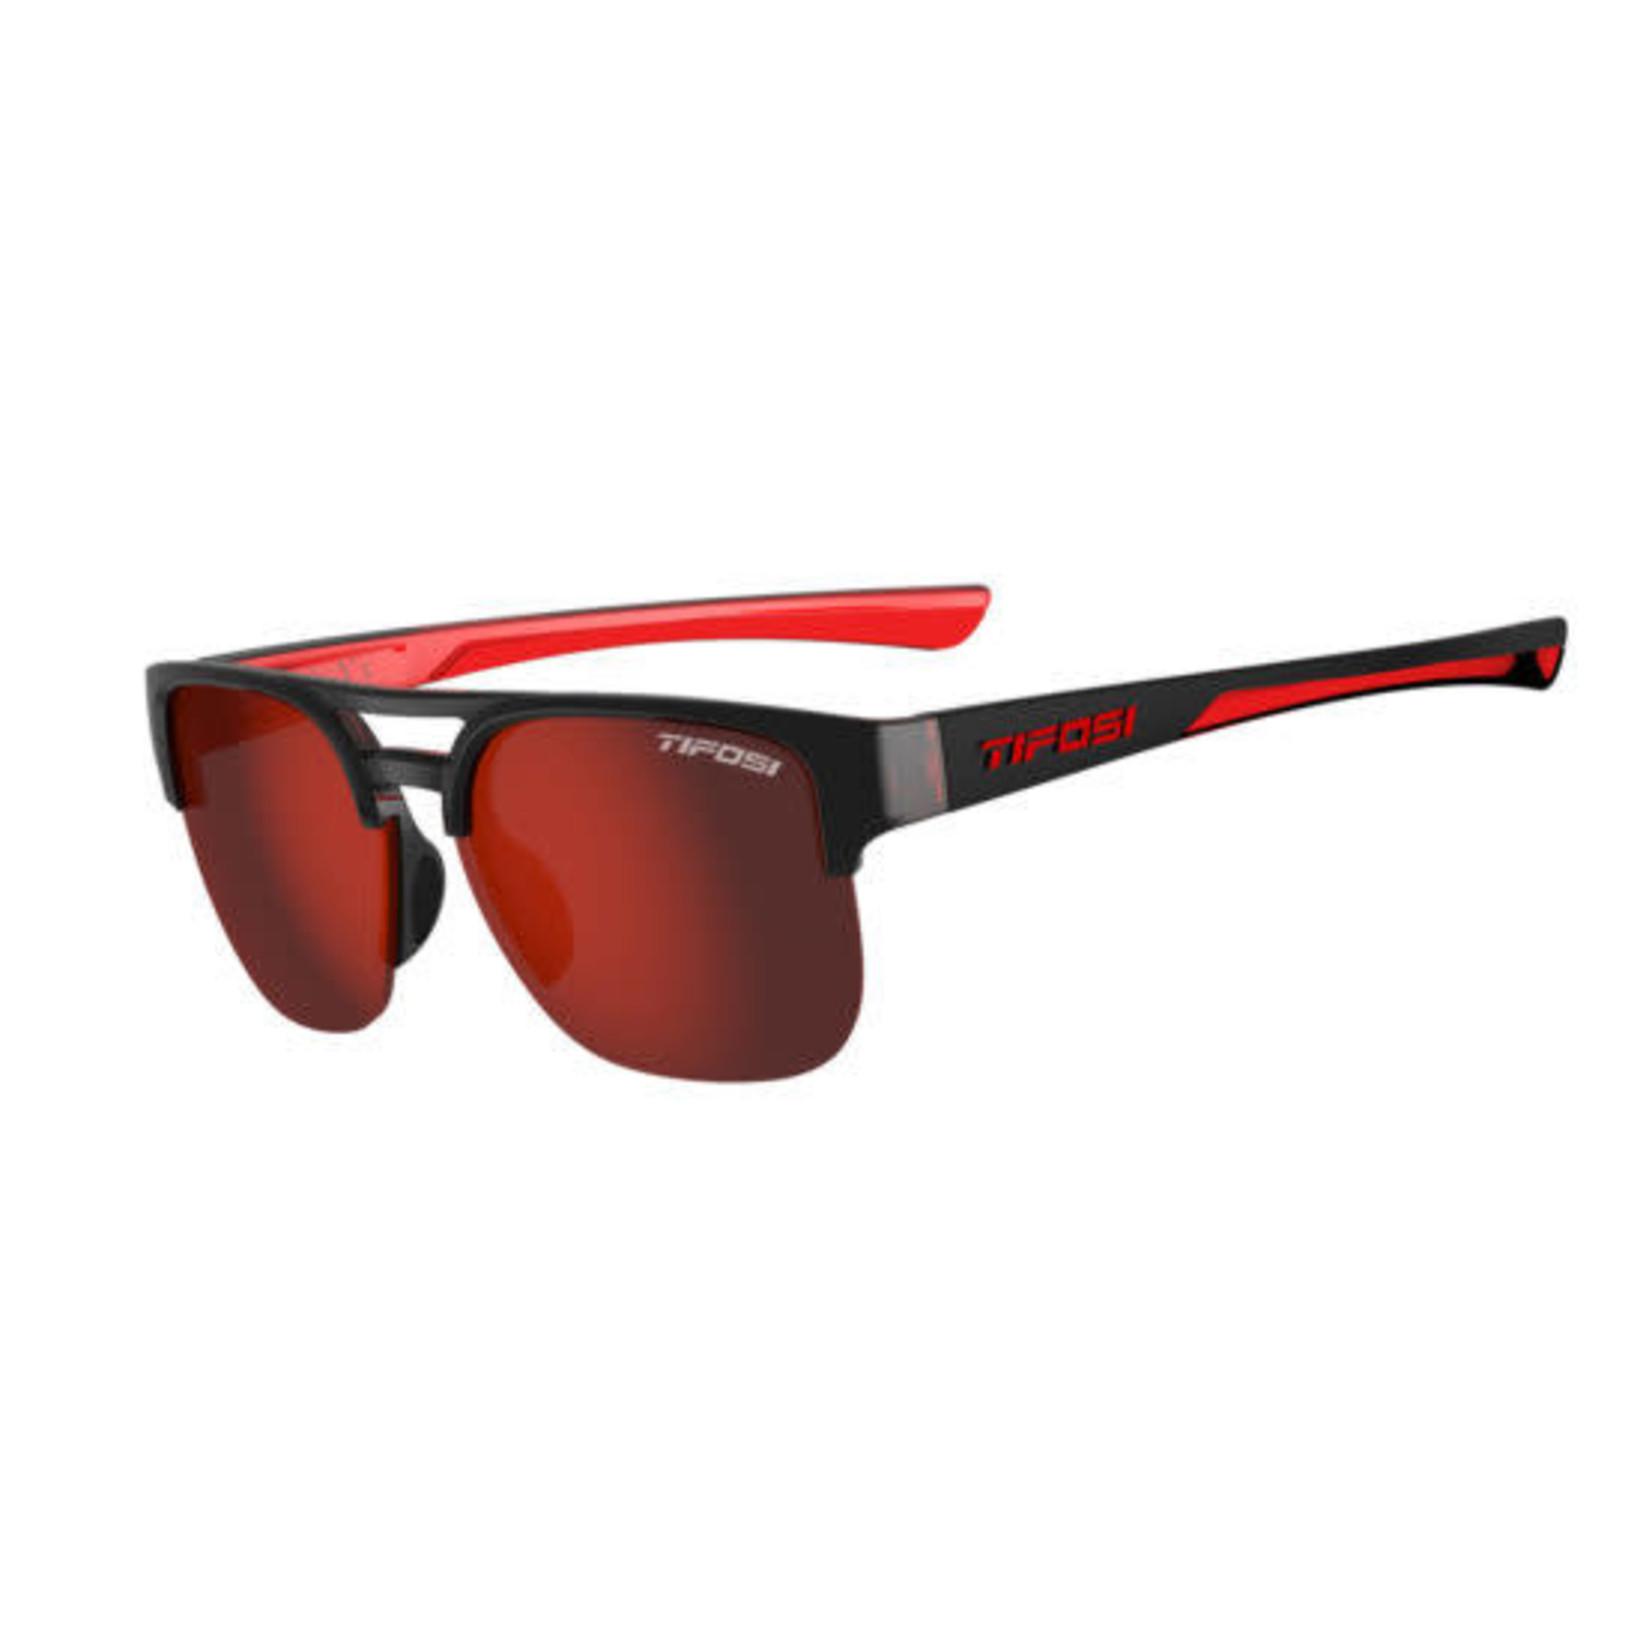 Tifosi Optics Salvo, Crimson Onyx Single Lens Sunglasses